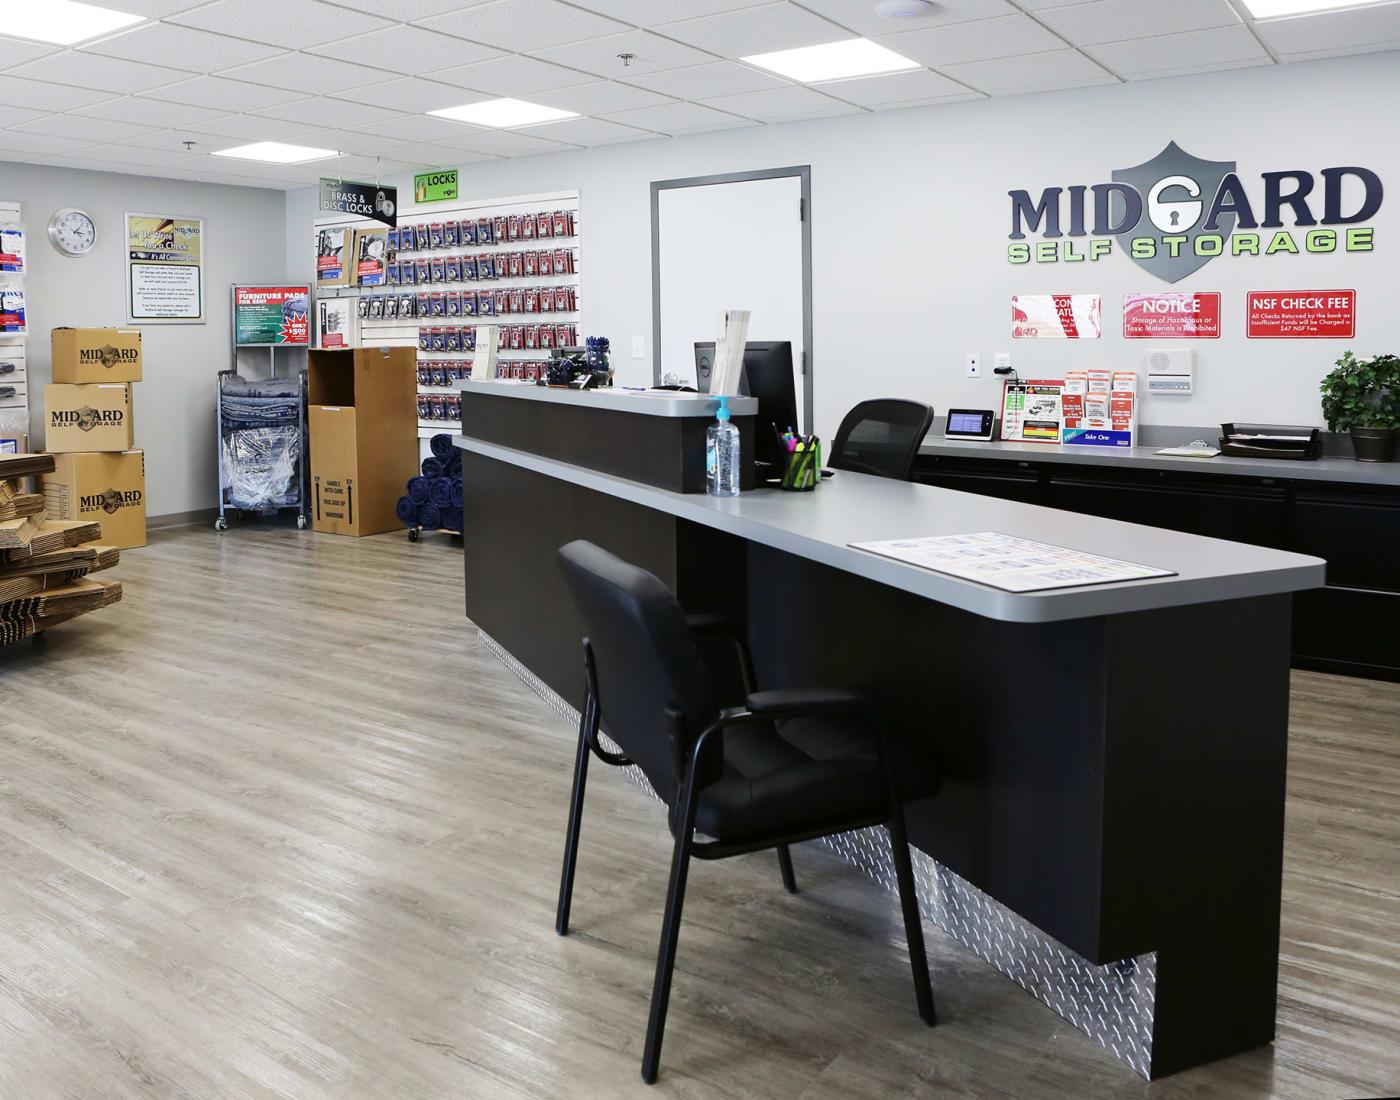 Leasing office at Midgard Self Storage in Midland, North Carolina